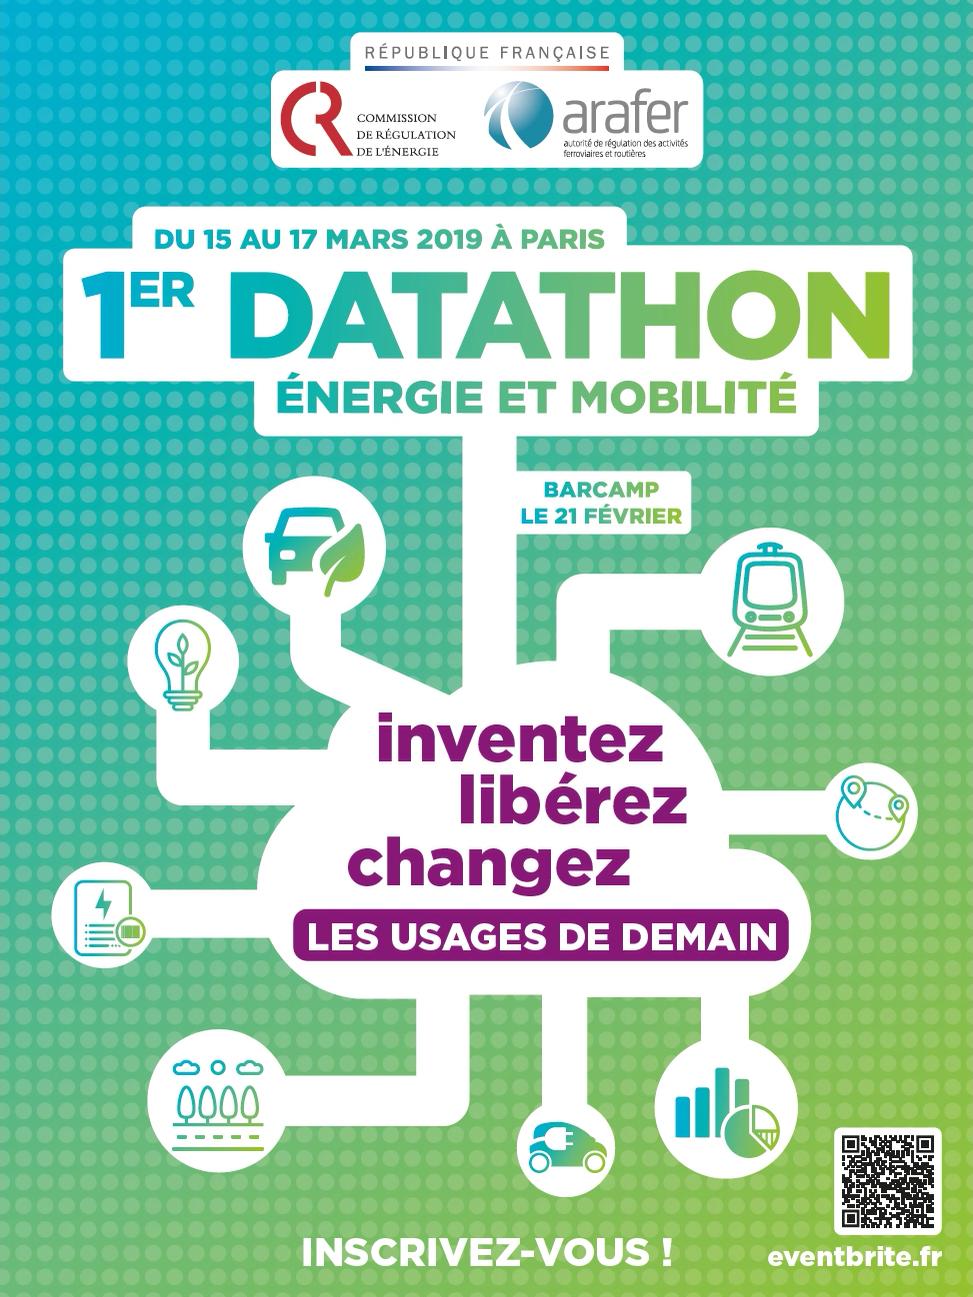 Affiche Datathon - 15 au 17 mars 2018